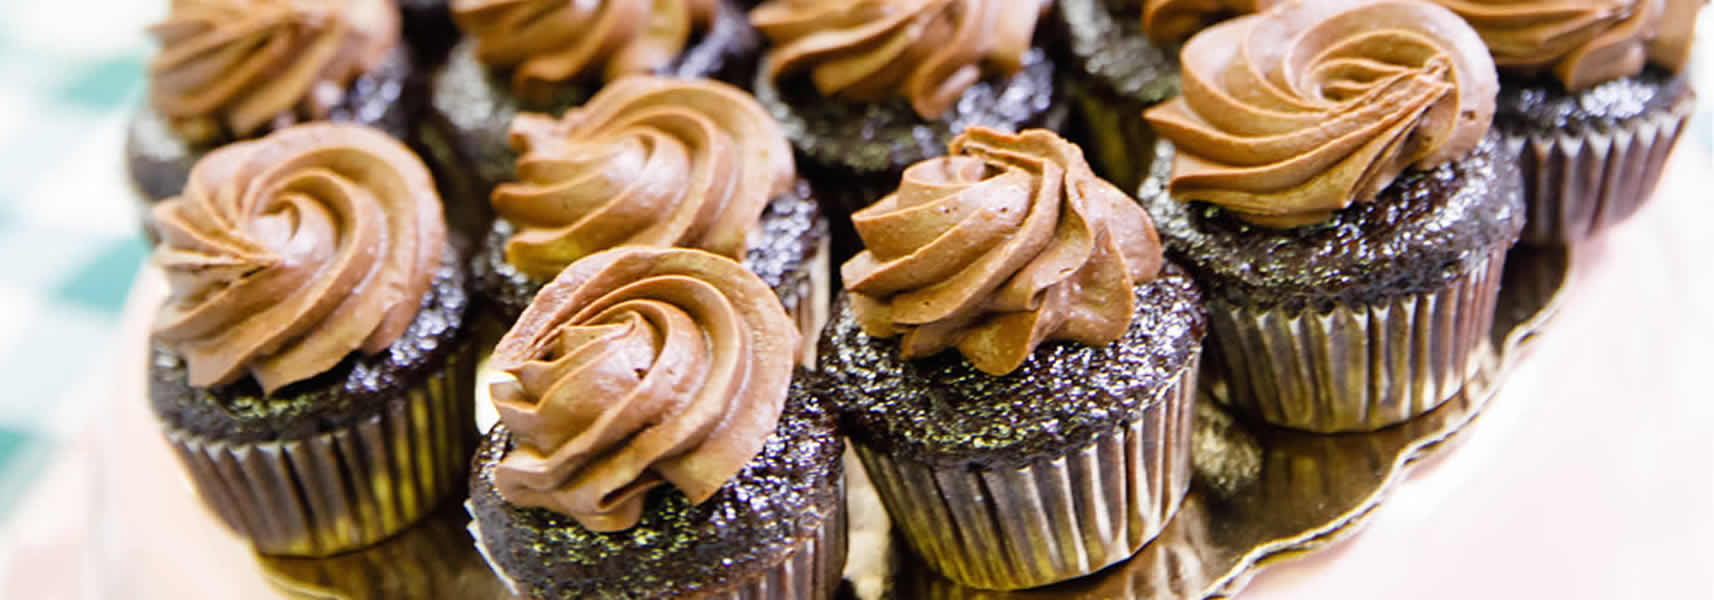 Close-Up of Mini Chocolate Cupcakes